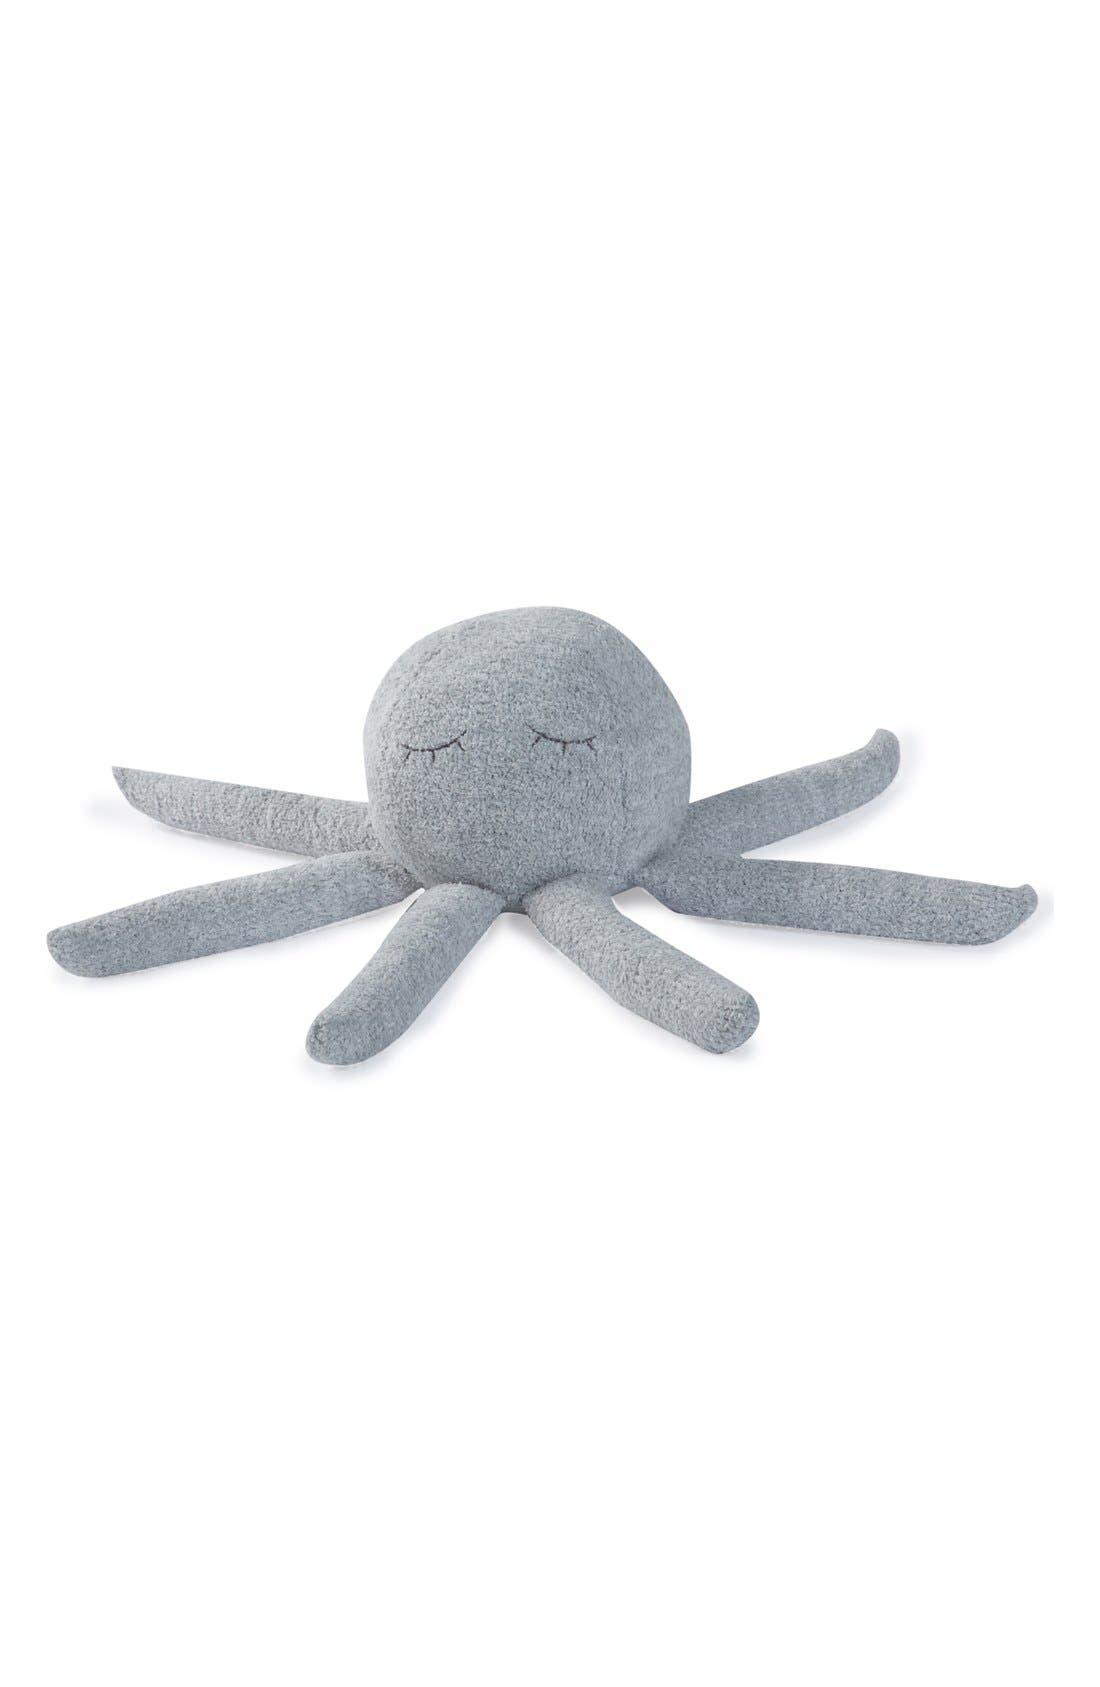 Barefoot Dreams® 'CozyChic® Octopus Buddie' Plush Toy